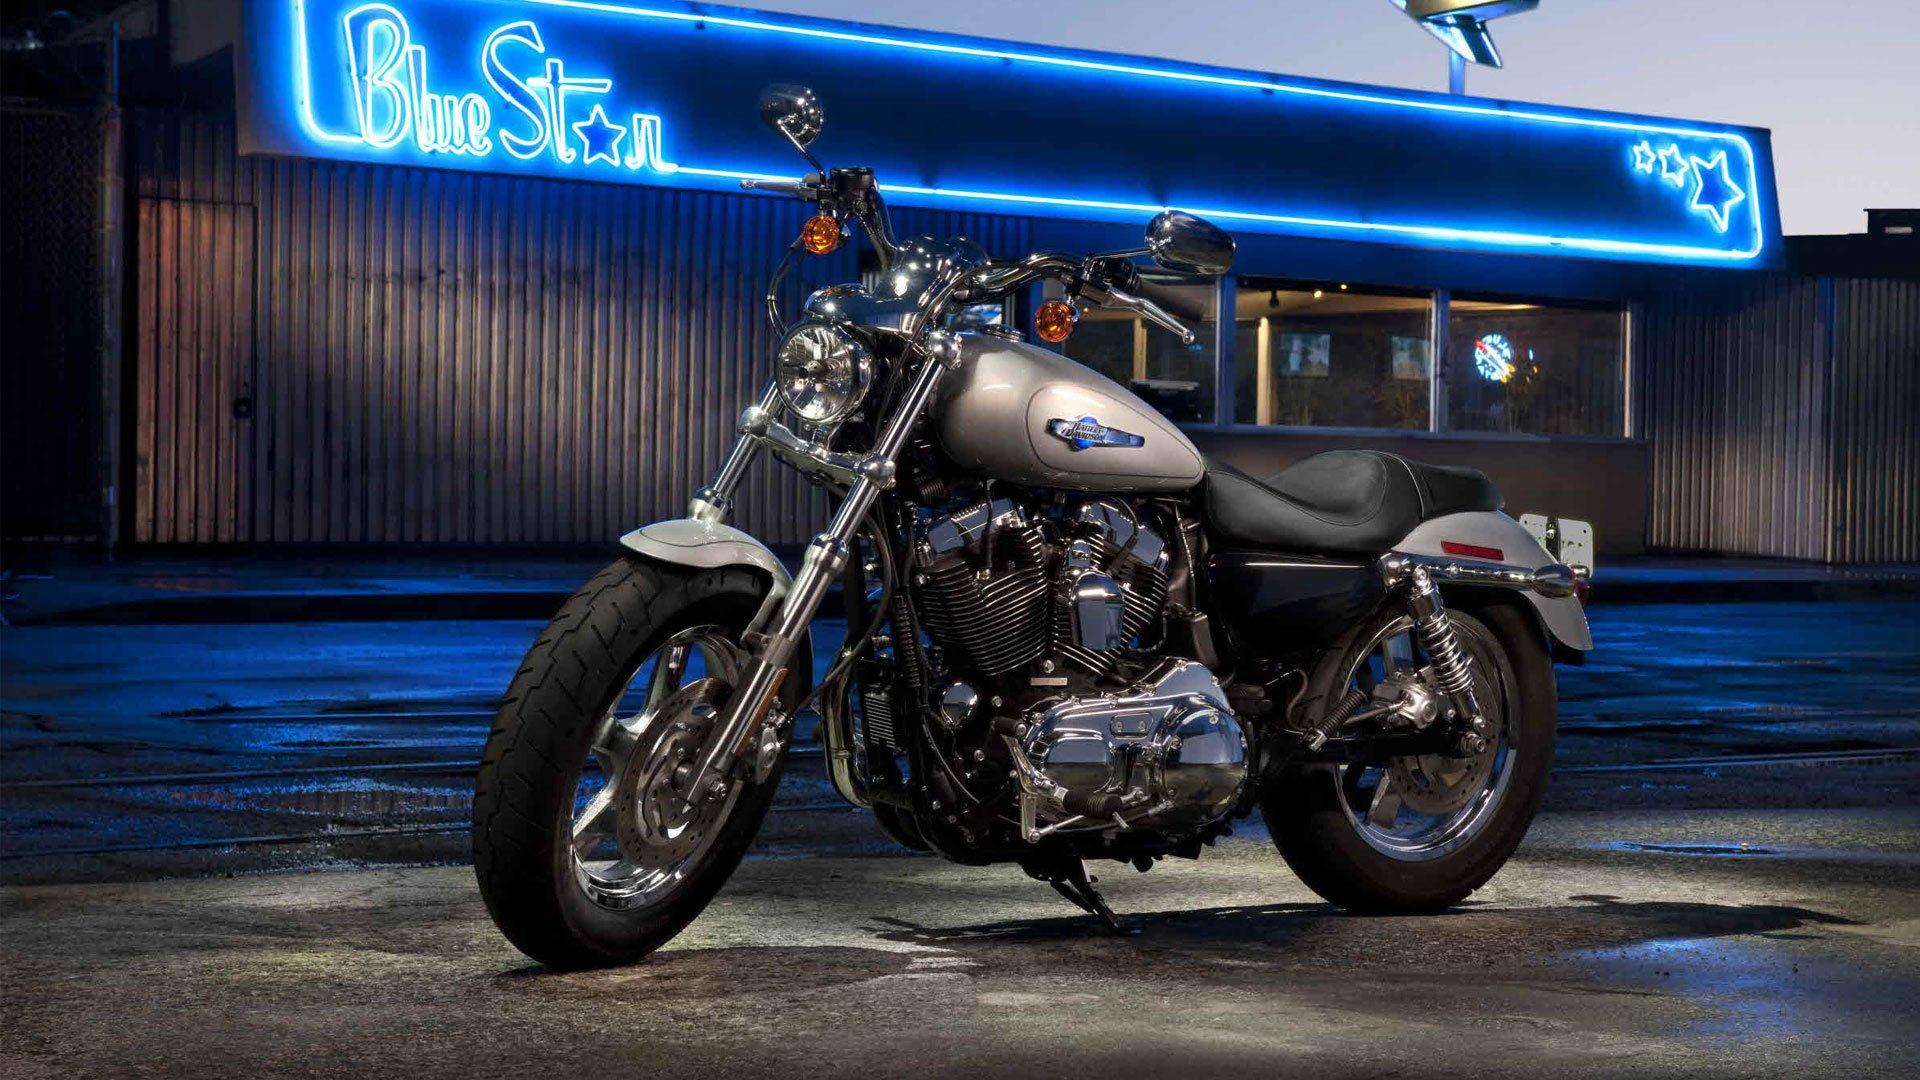 2012 Harley Davidson Sportster 1200 Custom wallpaper   981561 1920x1080